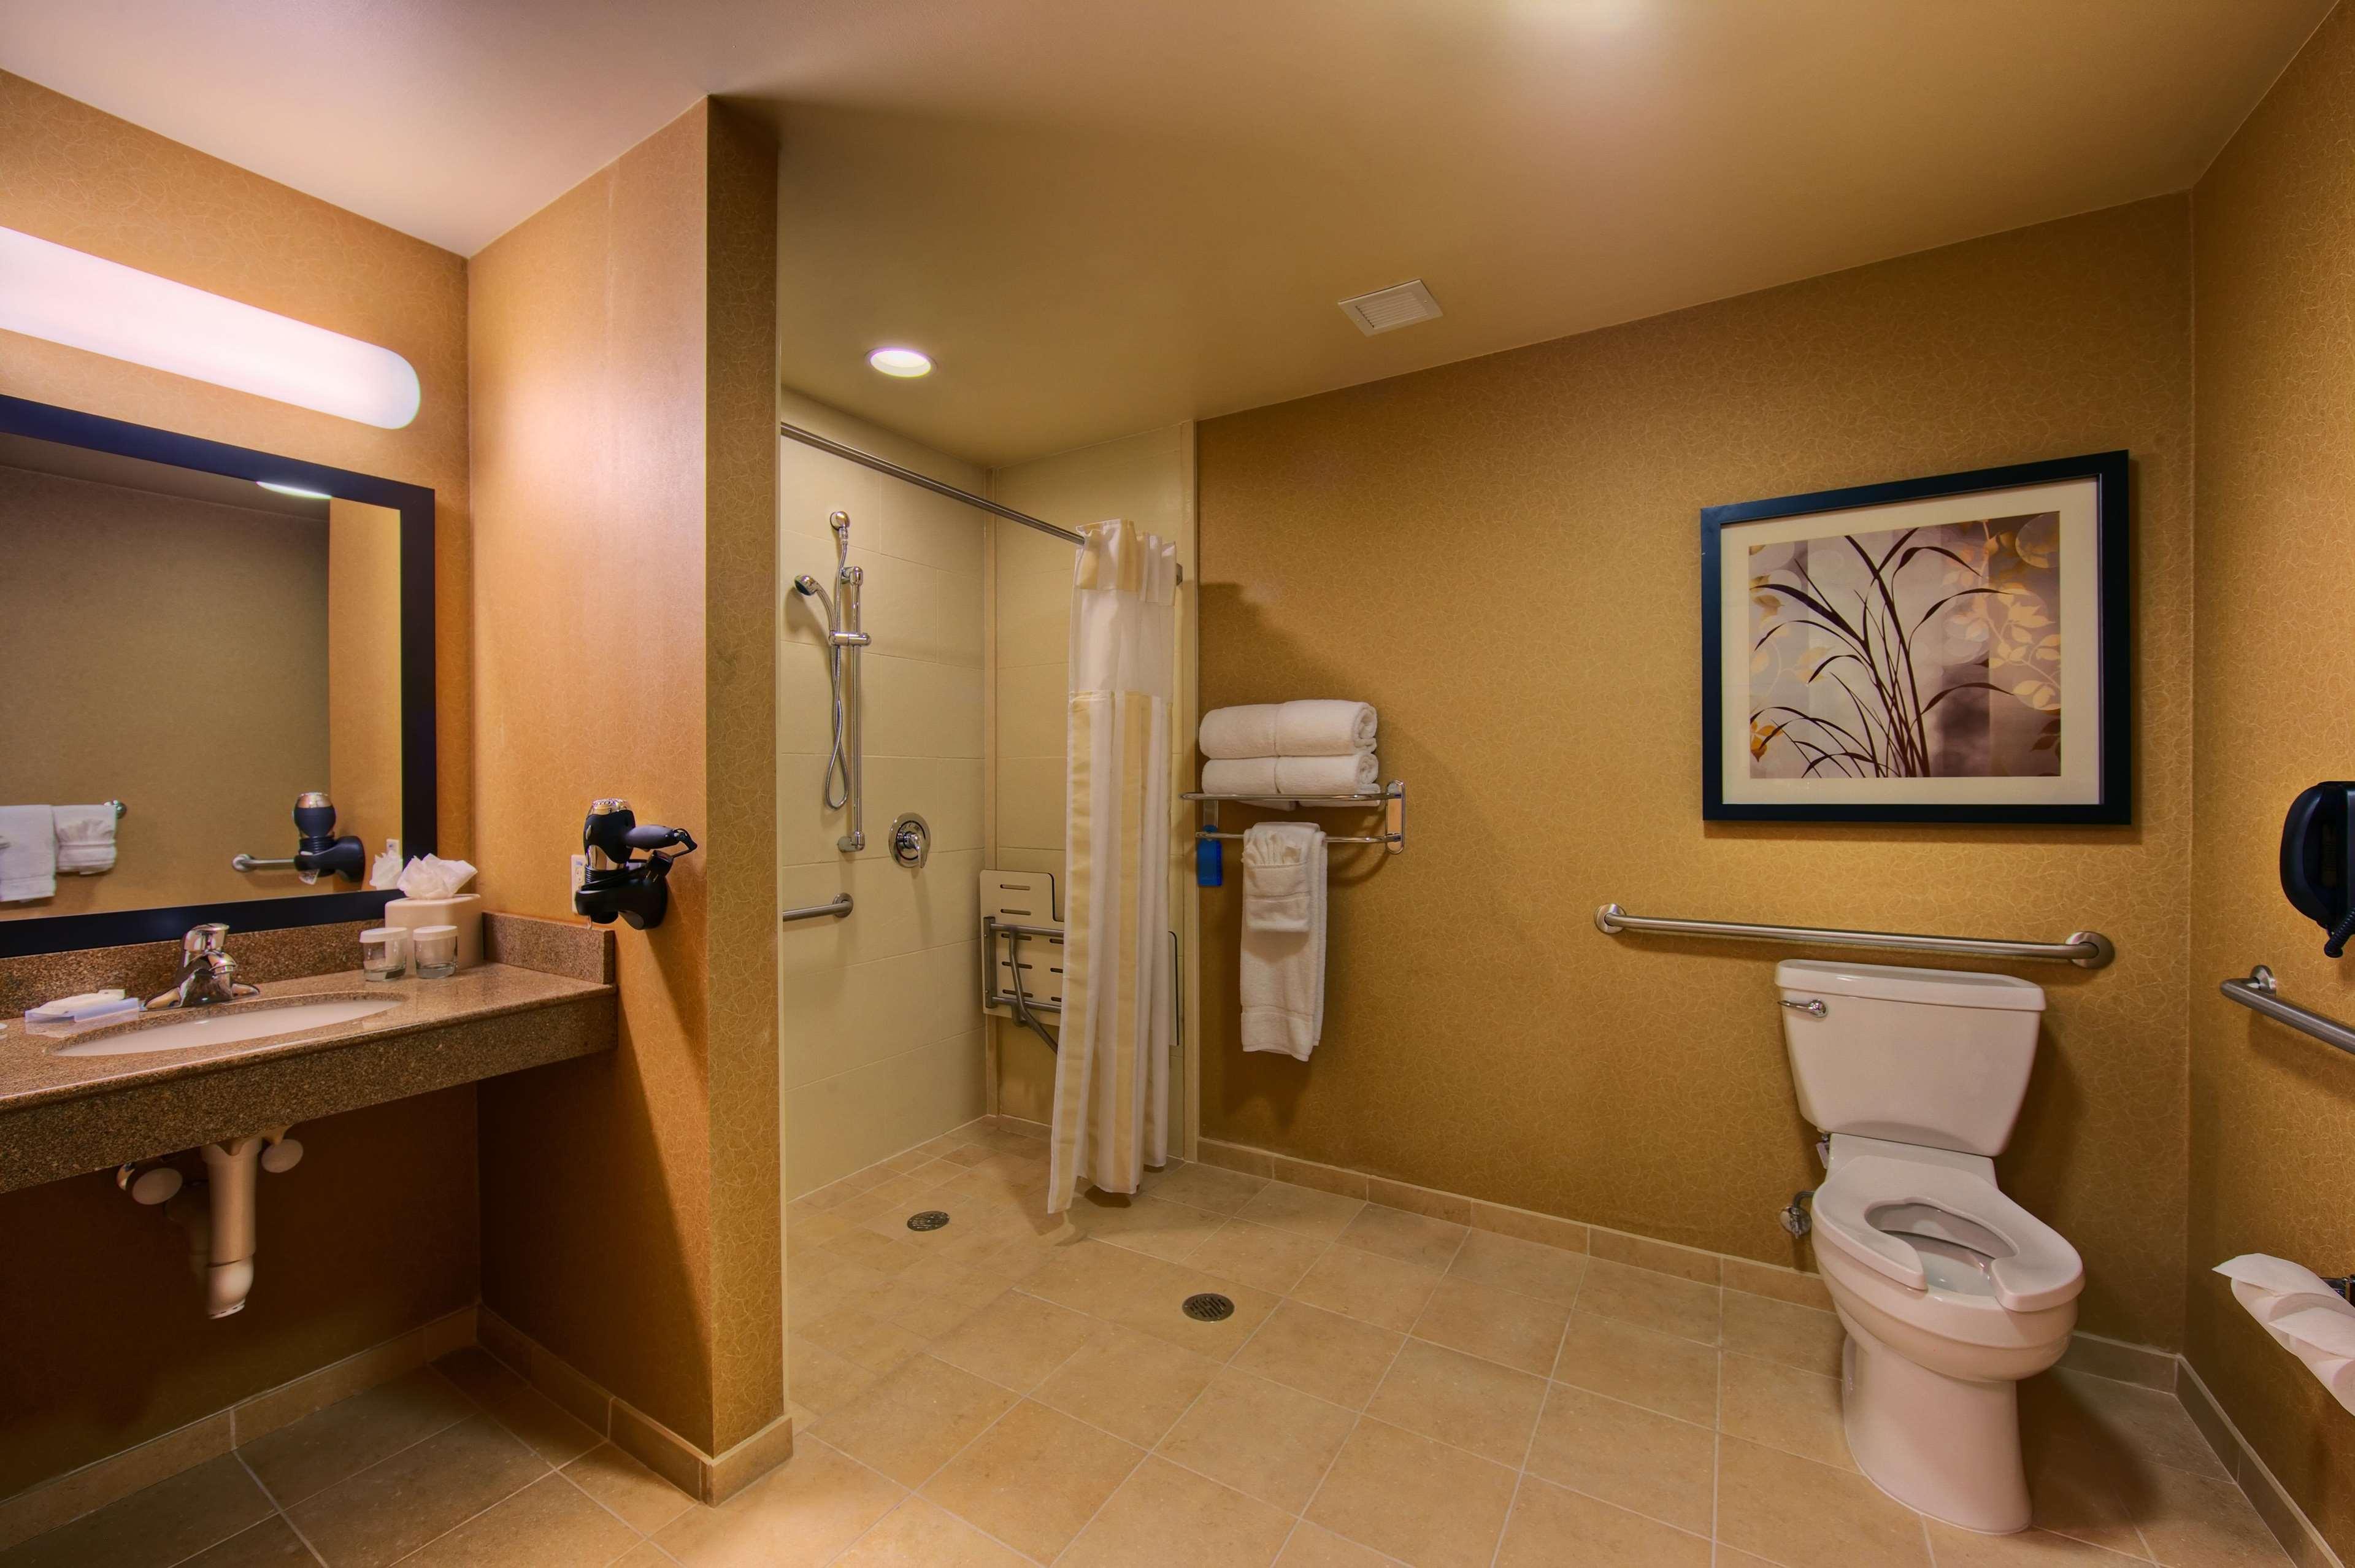 Hilton Garden Inn DFW North Grapevine image 27